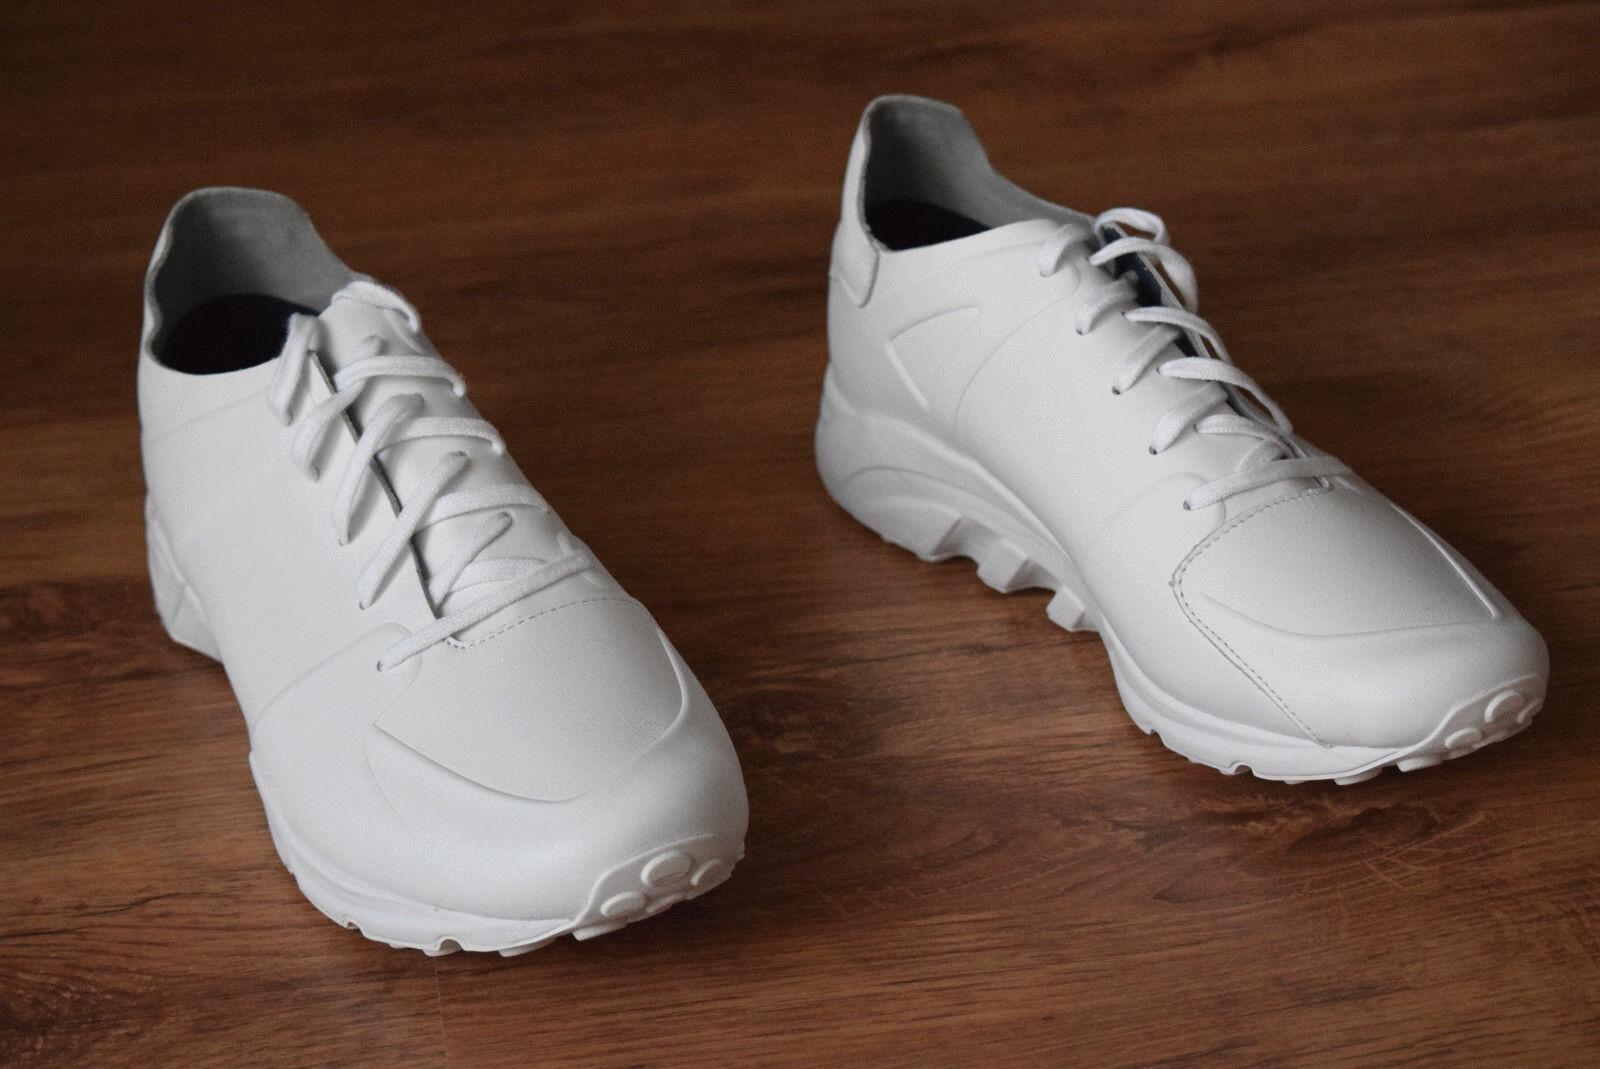 Adidas Equipment Support 93 Nuude 40,5 41 42 42,5 44 cOnSorTium guidance S76702